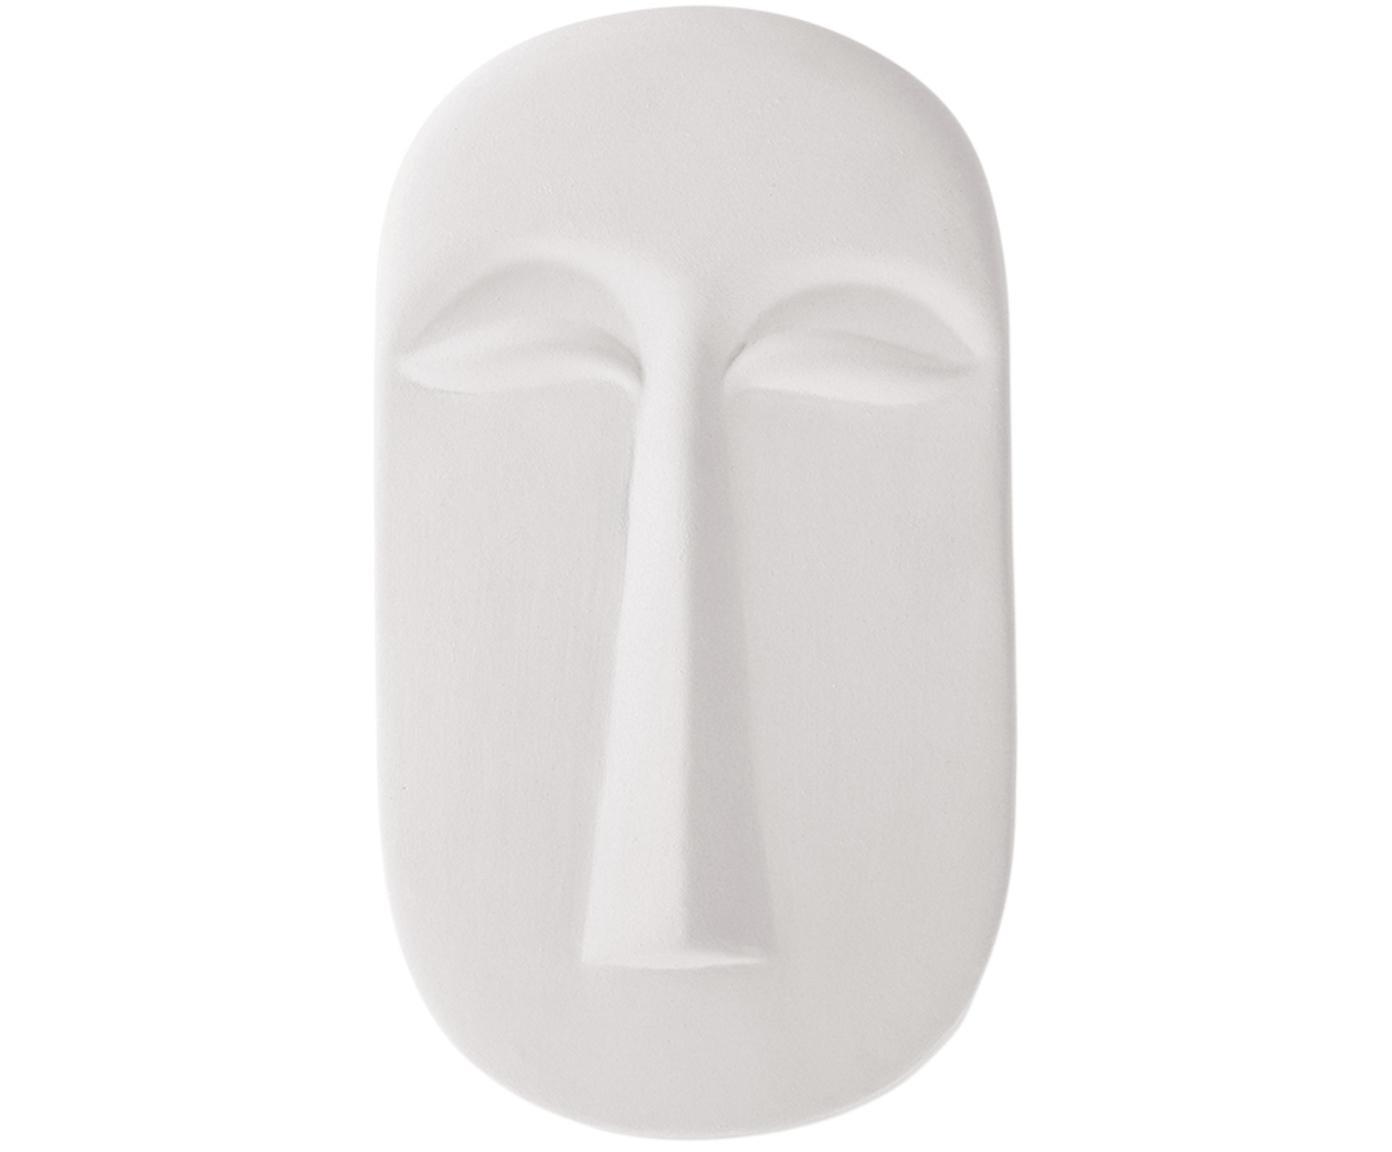 Wandobjekt Mask aus Keramik, Keramik, Weiss, B 13 x T 24 cm